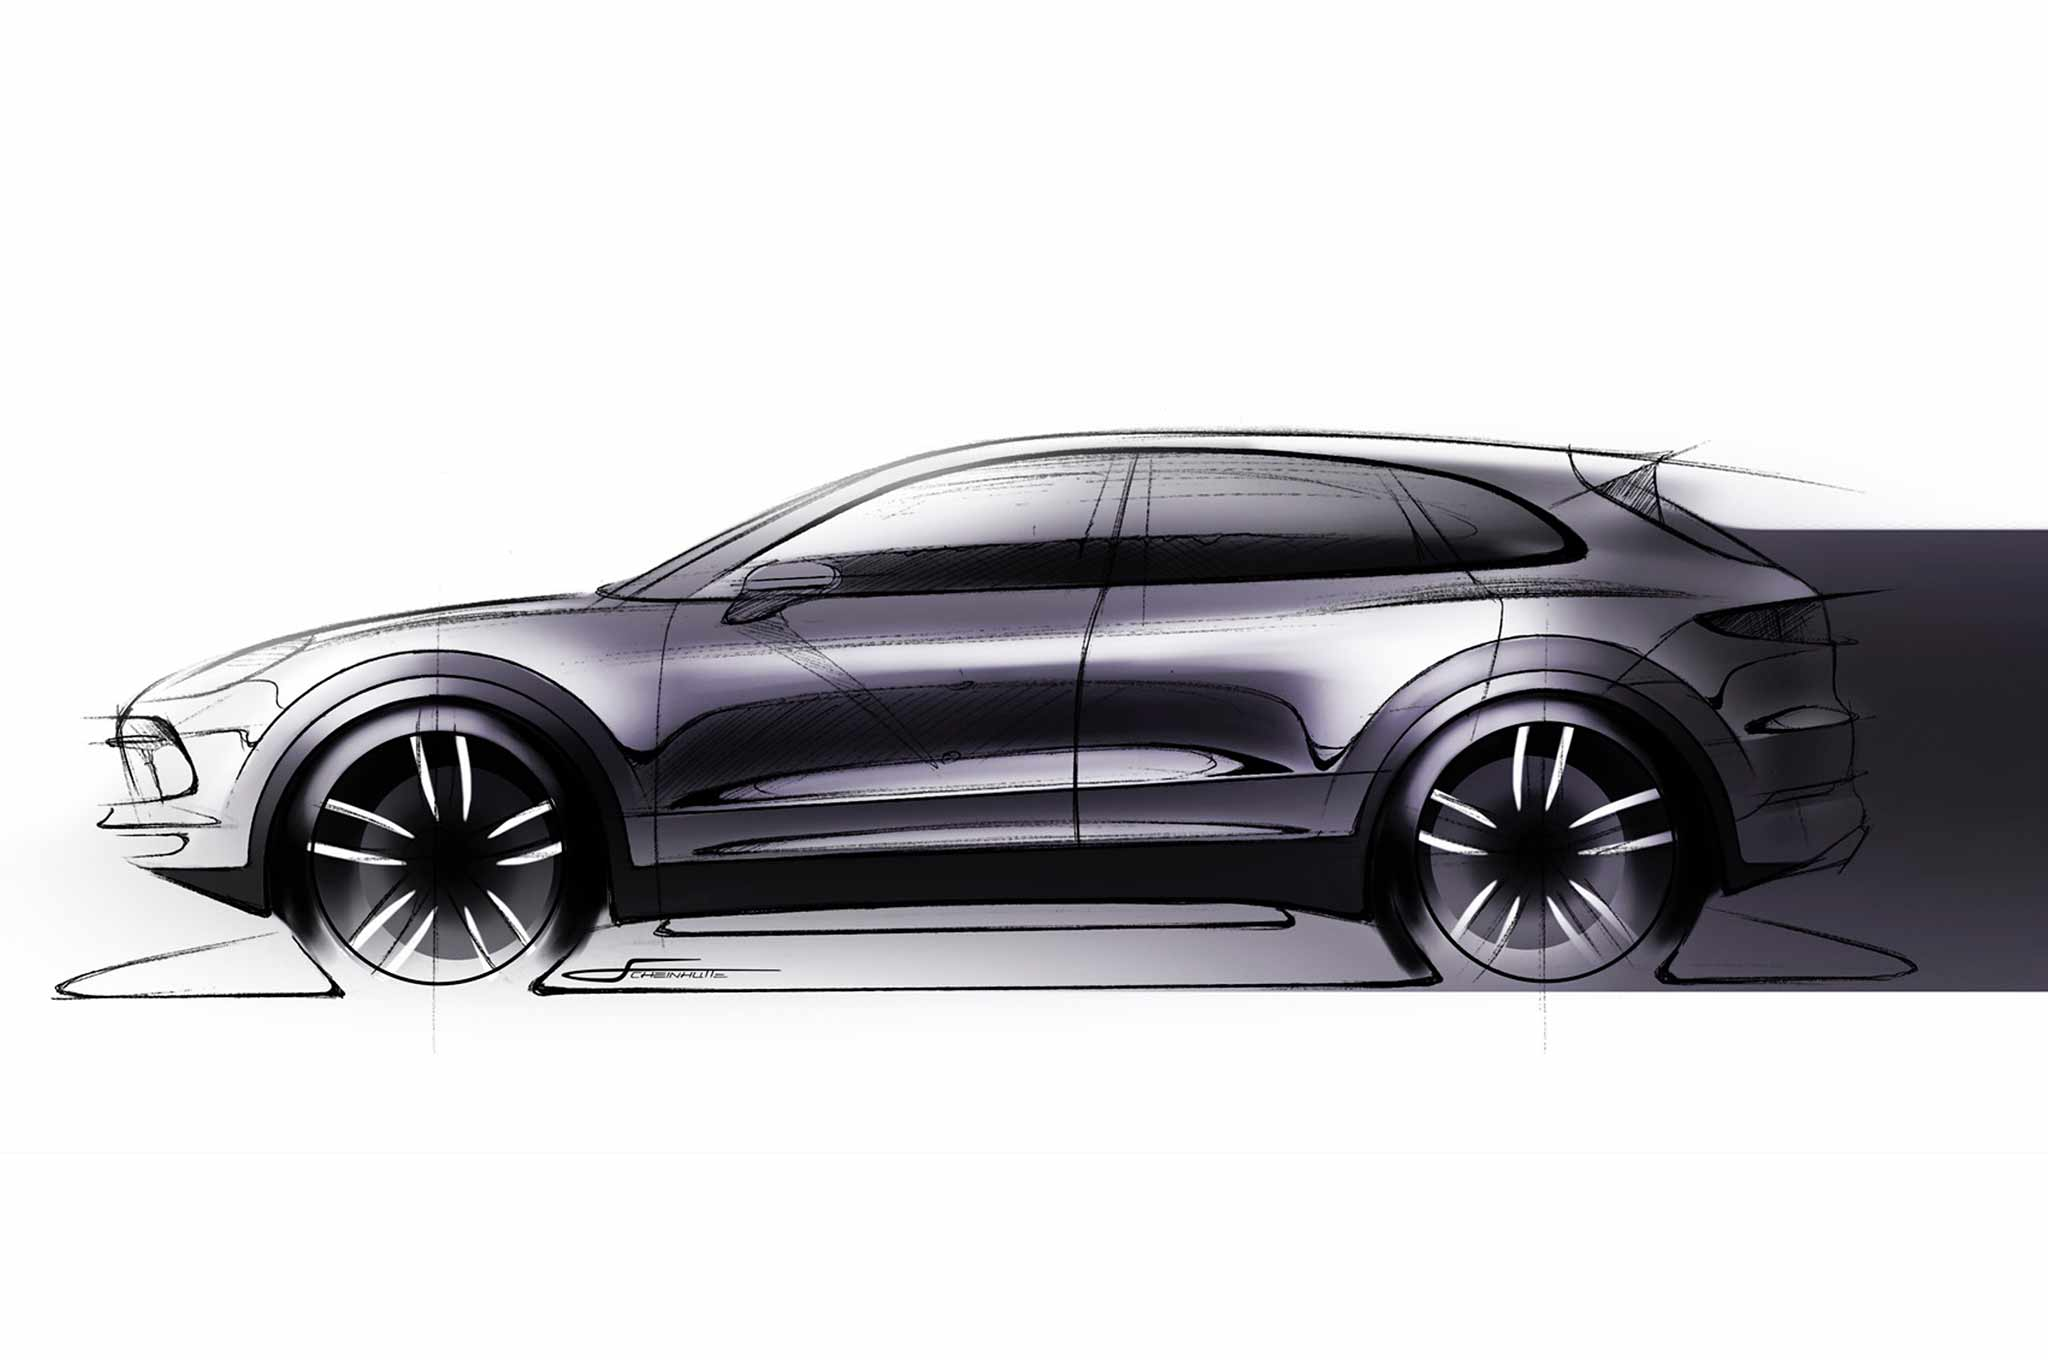 porsche cayenne teaser sketch reveals new suv s profile automobile magazine. Black Bedroom Furniture Sets. Home Design Ideas